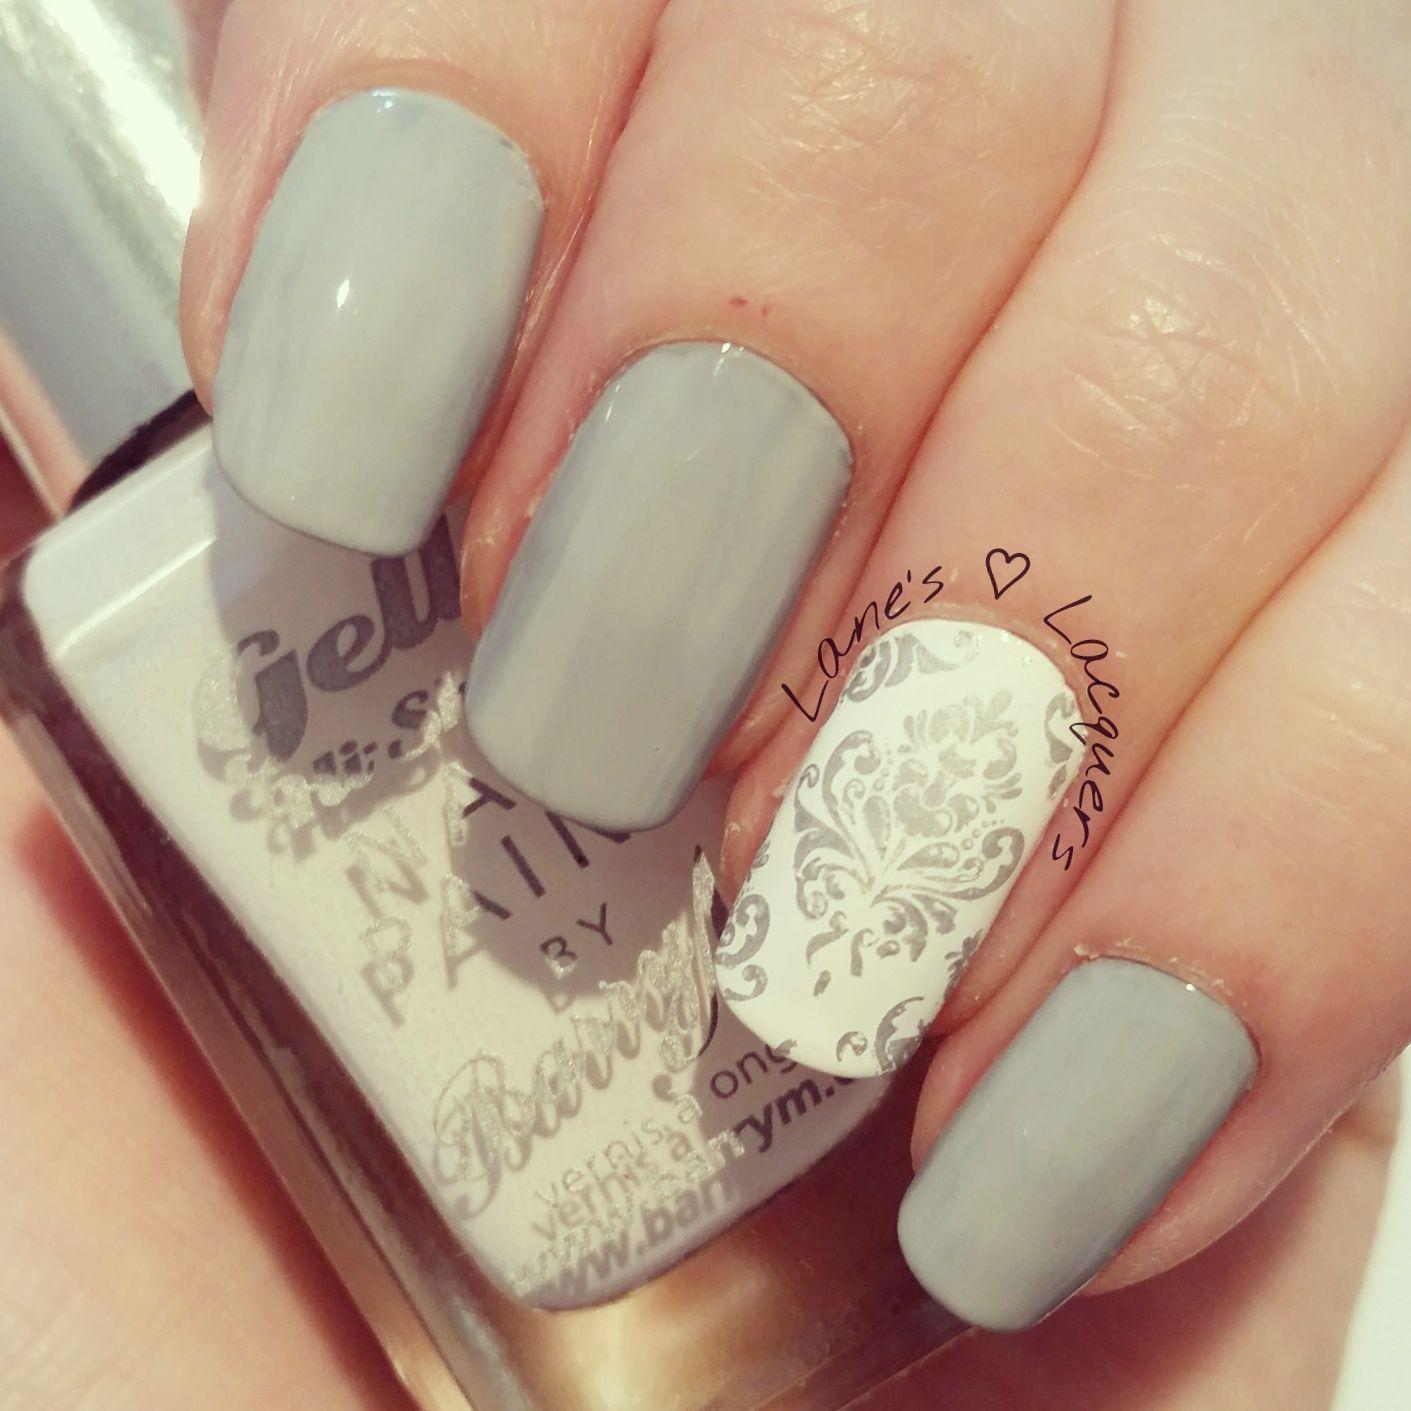 diy-inspired-grey-white-silver-floral-nail-art (3) | nails | Pinterest